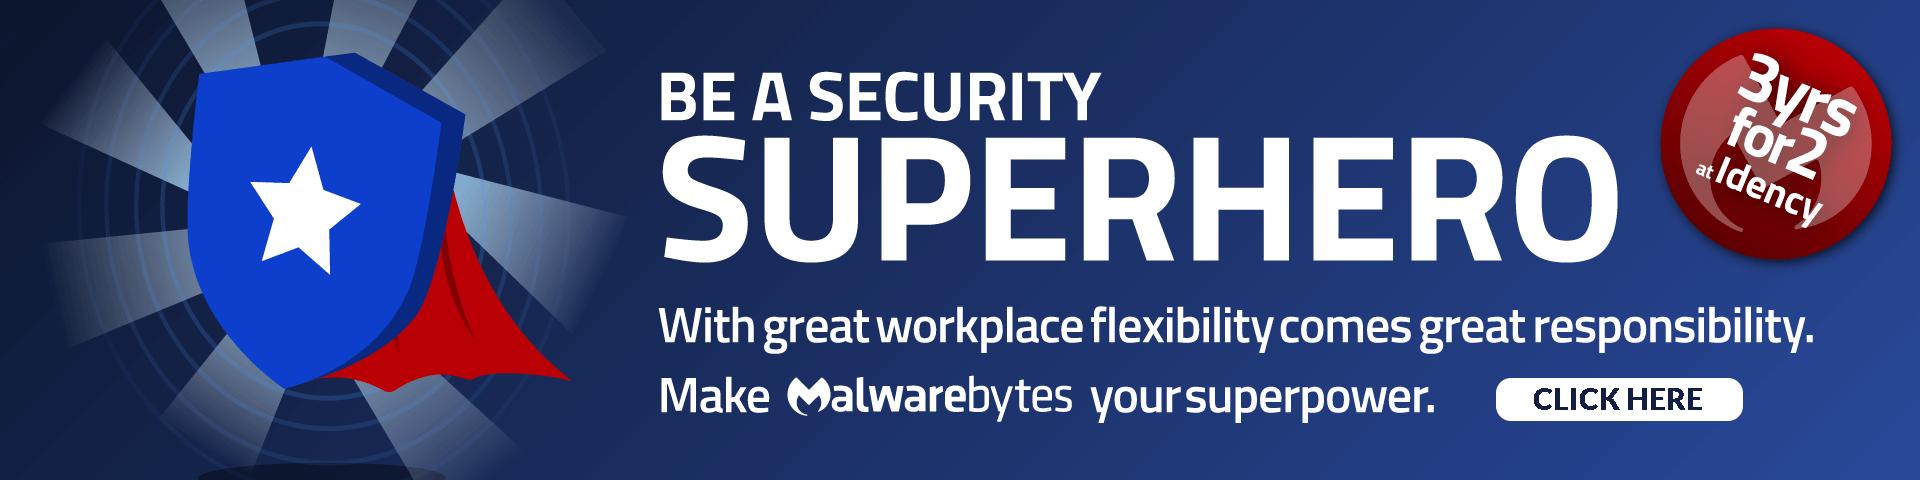 Malwarebytes Buy 2 Years Get 3rd Free Banner - click here